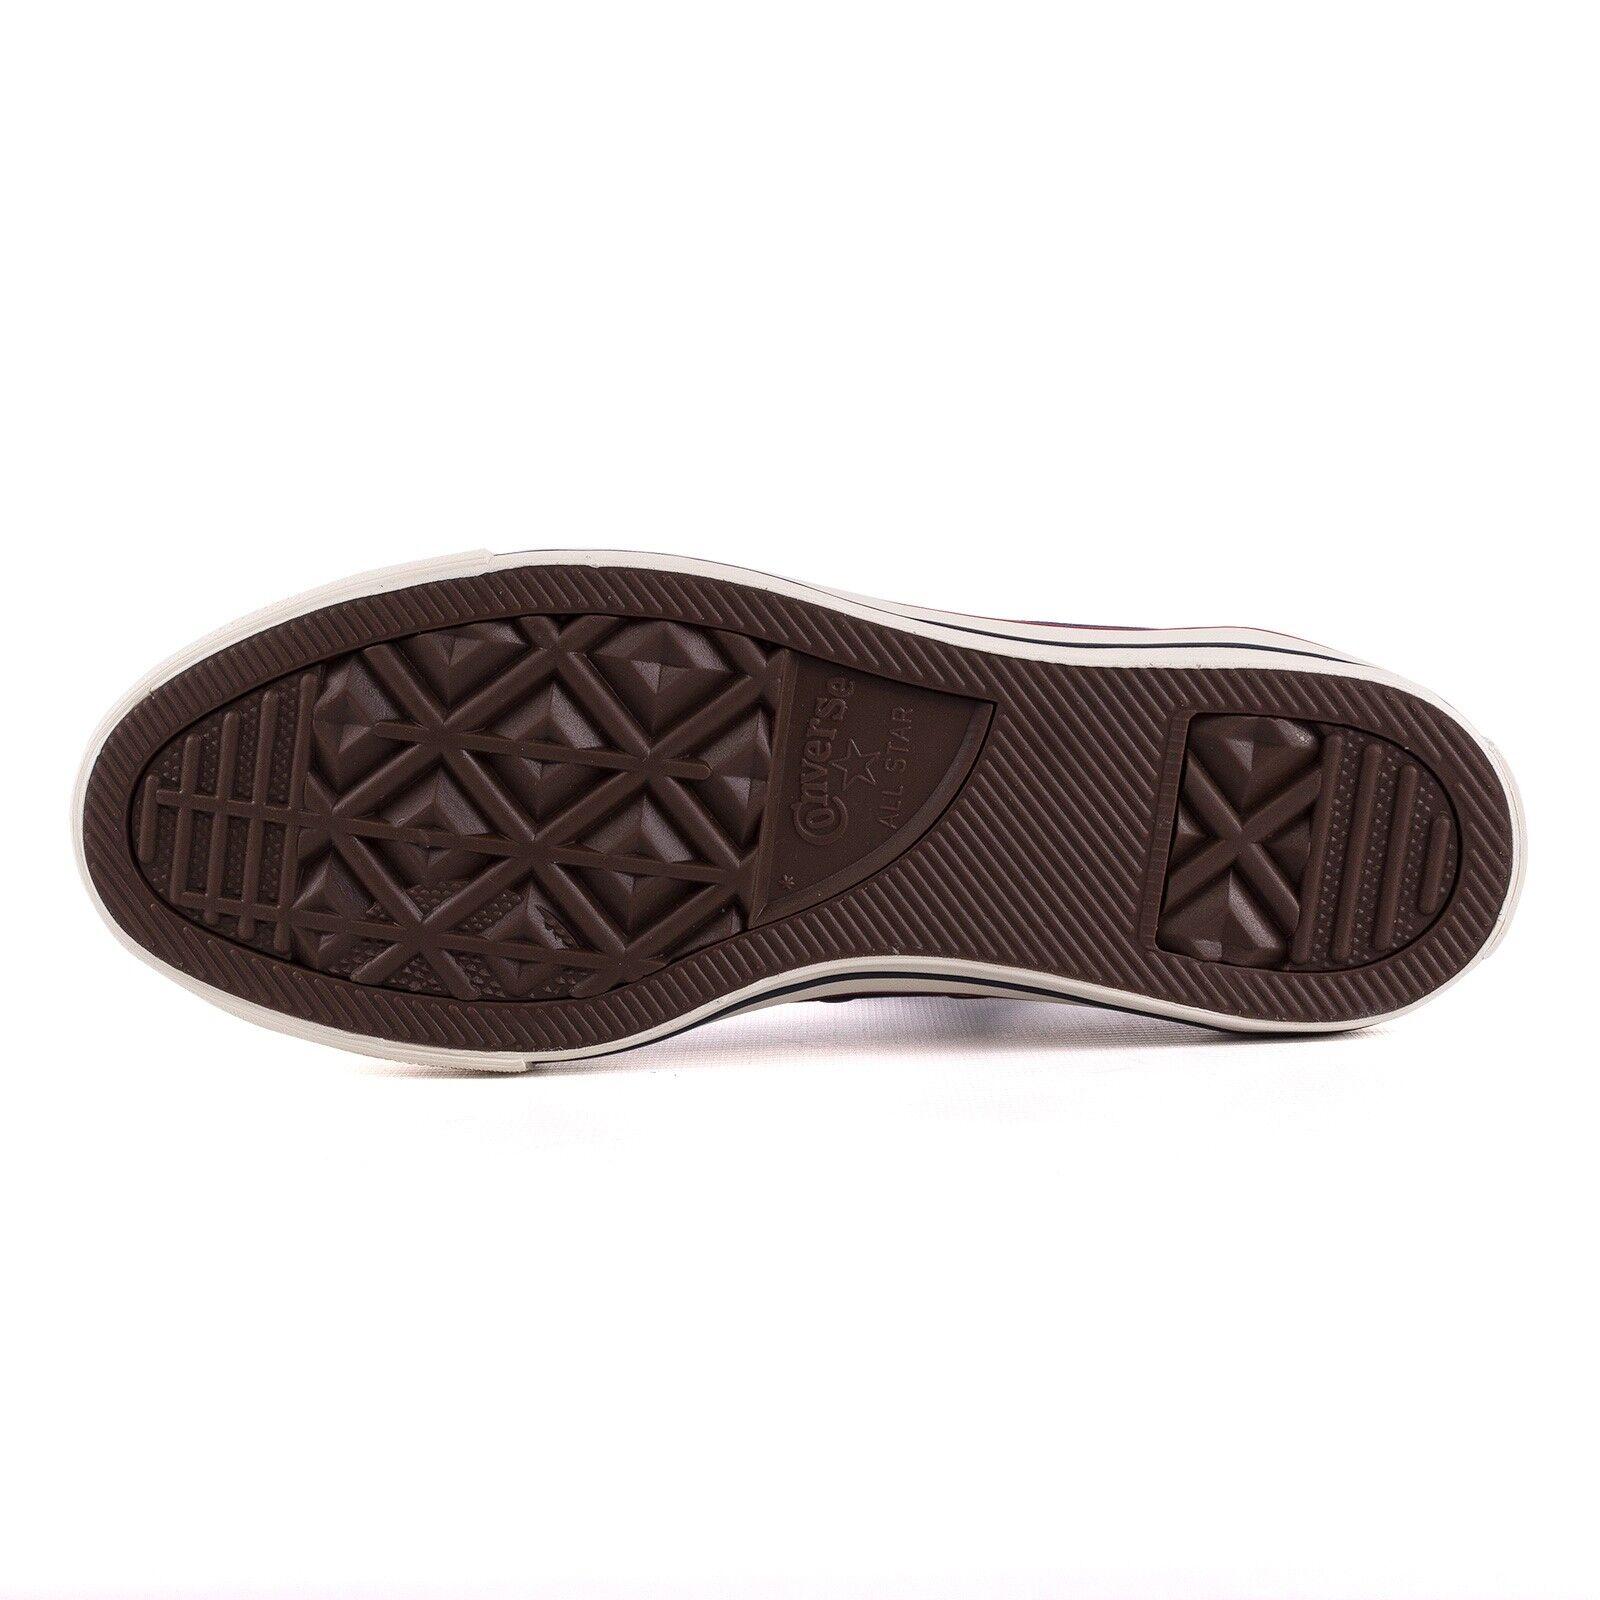 Converse Ctas Ox Sneaker Damenschuh Sneaker Ox navy 51301 fcedbe